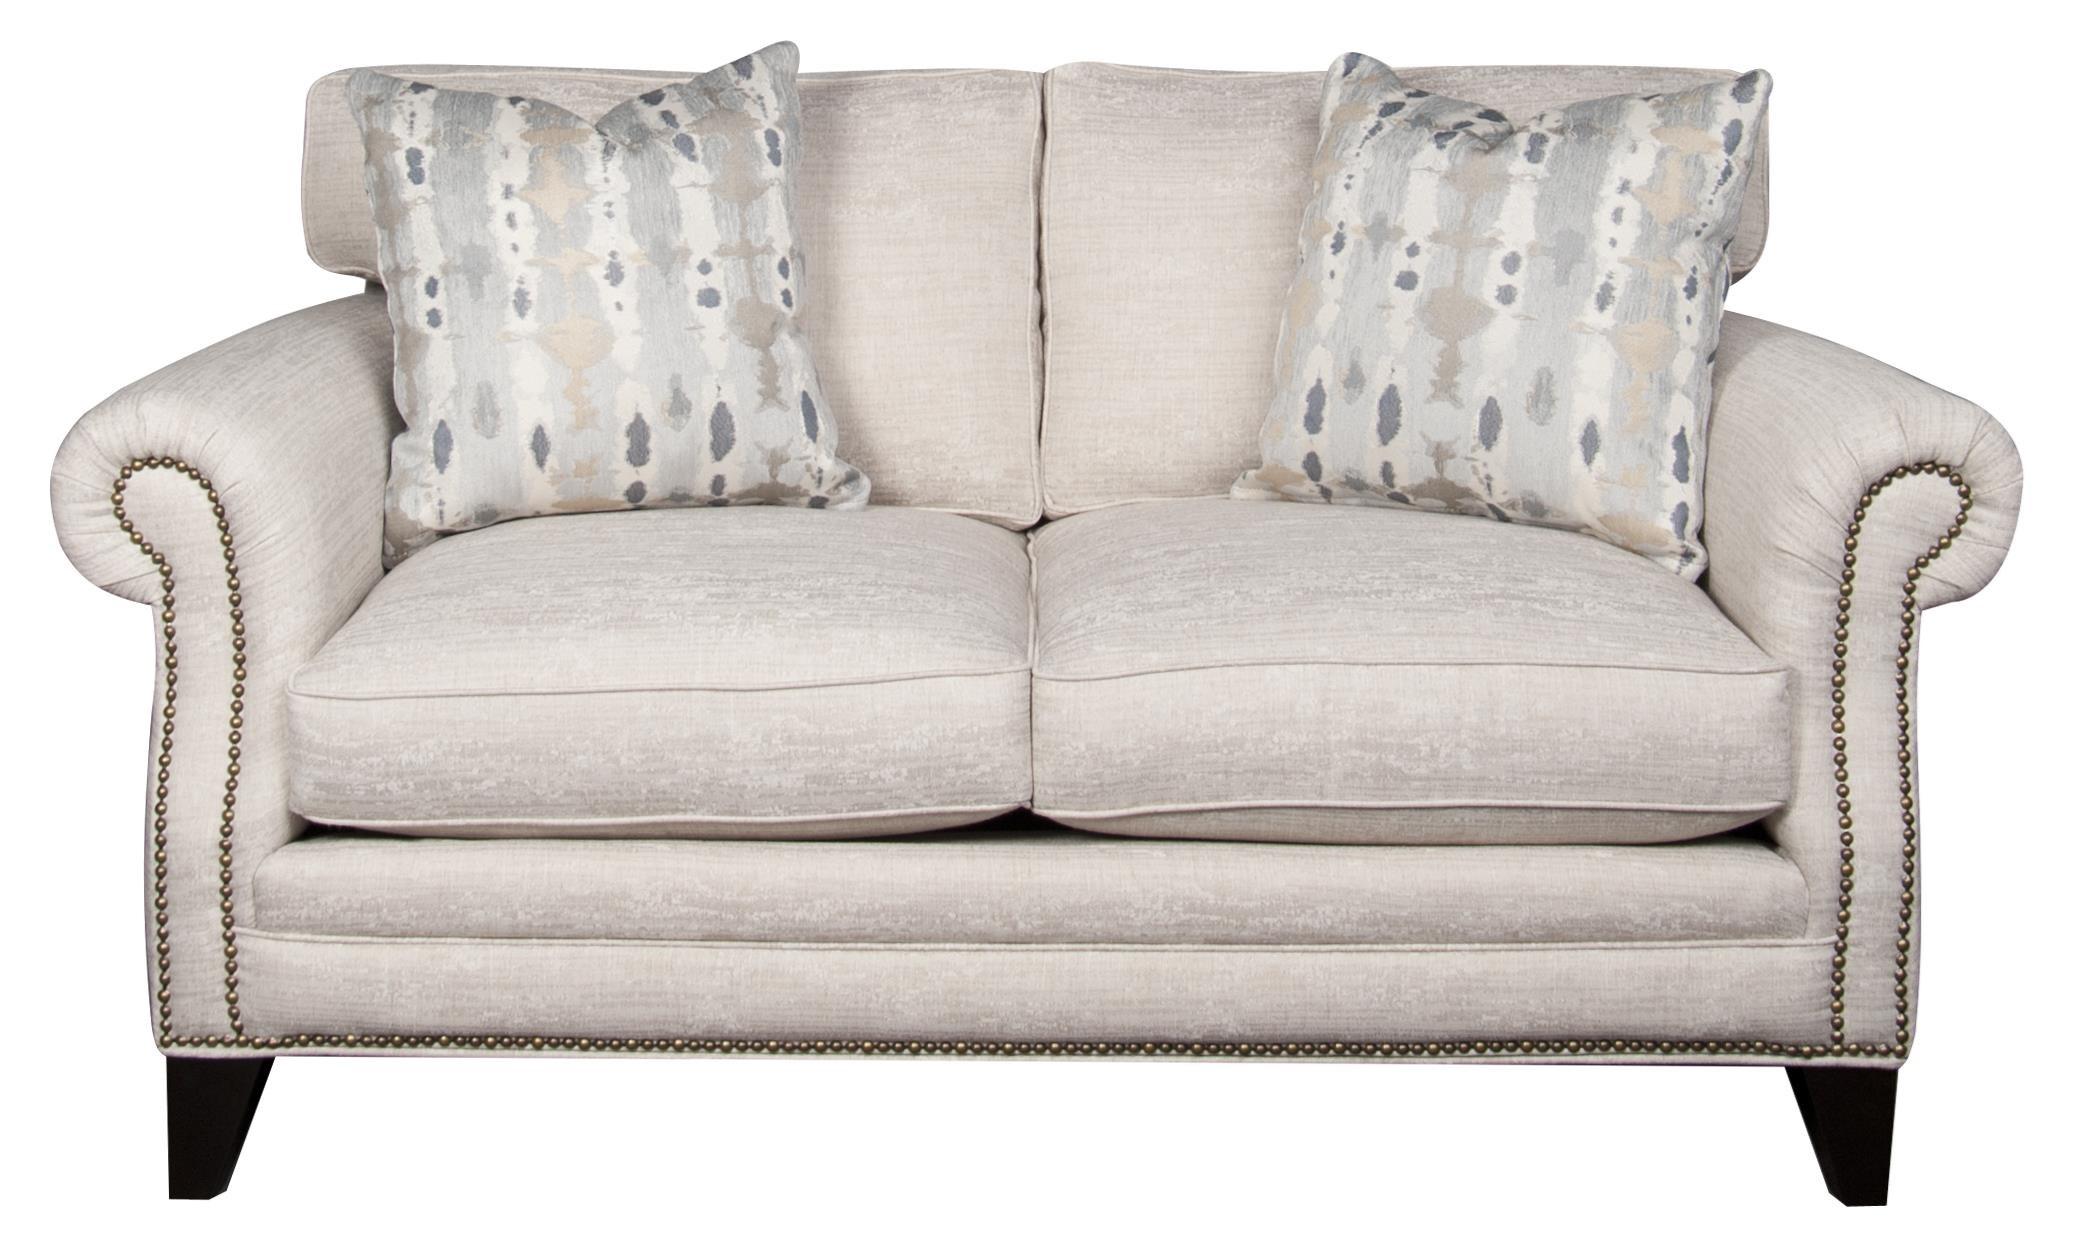 Morris Home Furnishings Helen - Helen Loveseat - Item Number: 203226697